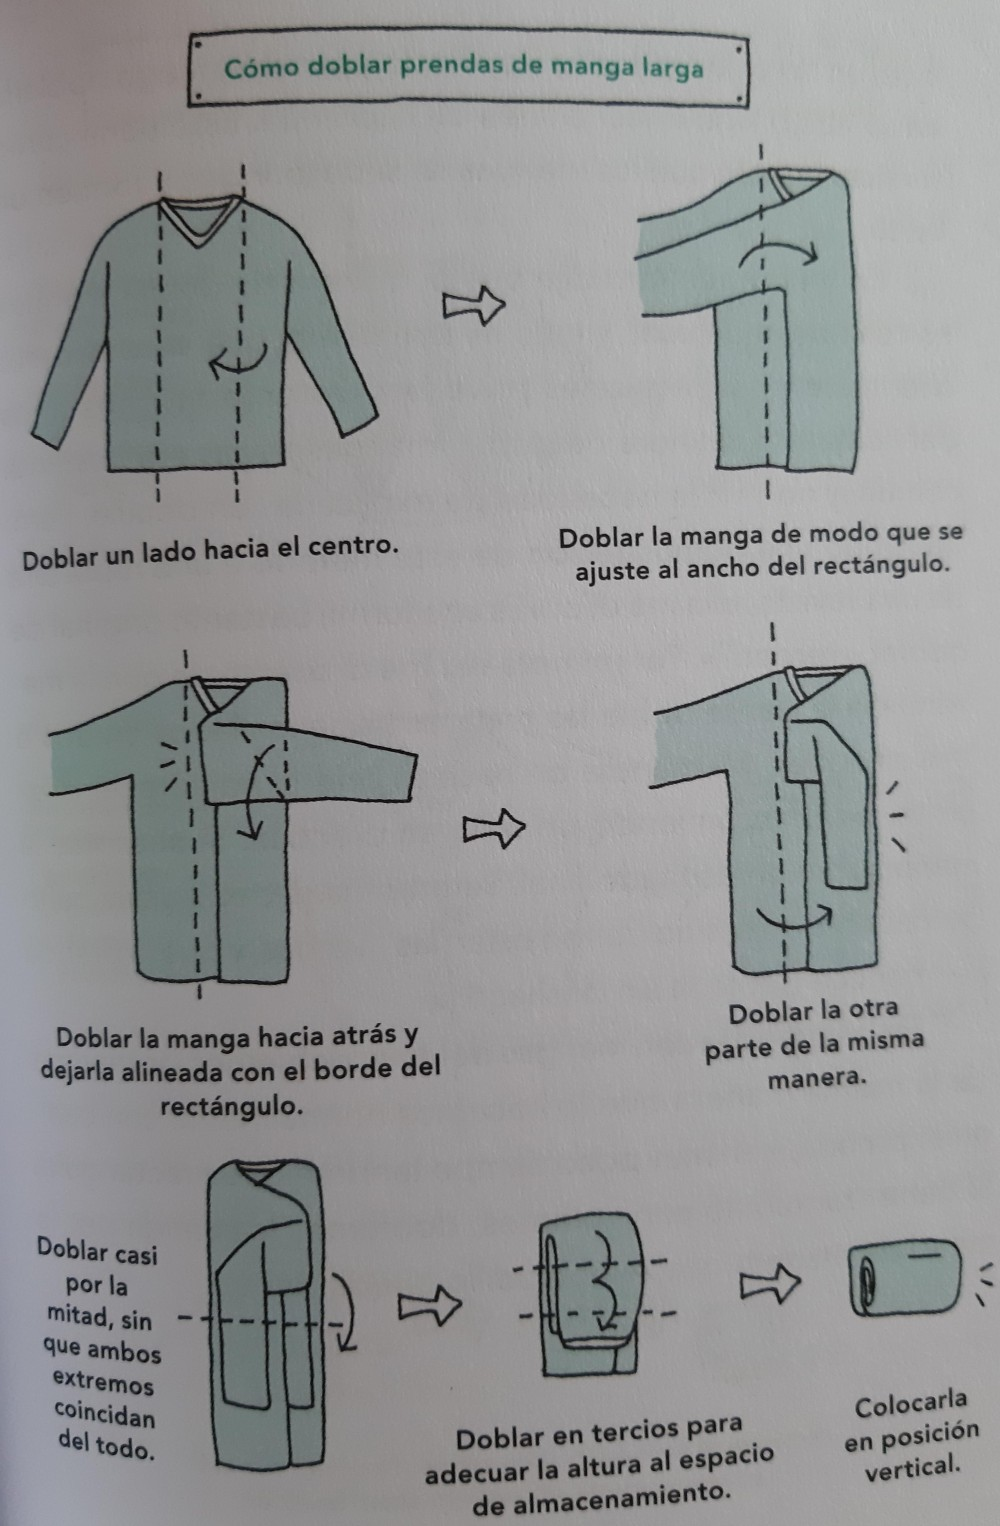 Como doblar prendas de manga larga